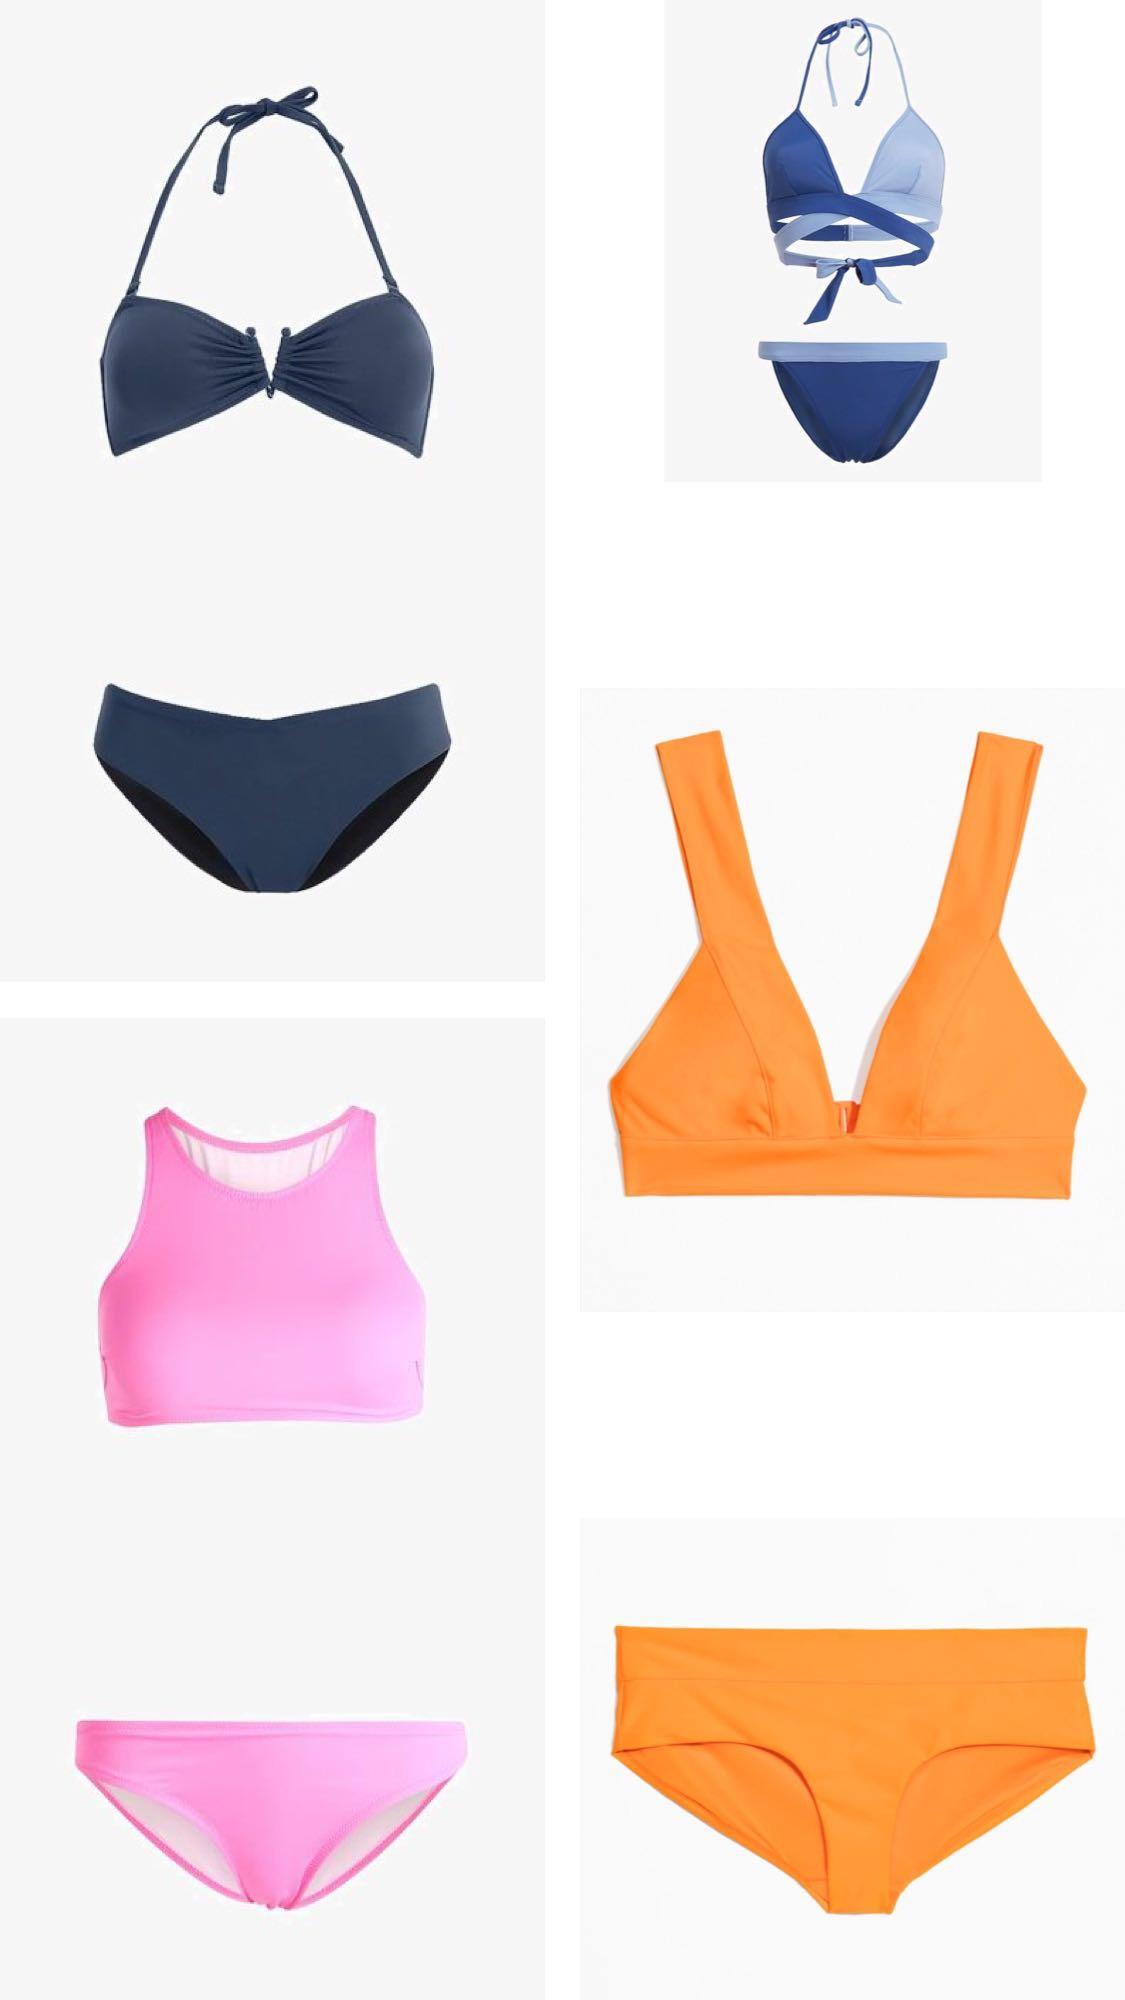 bikini til budsjett